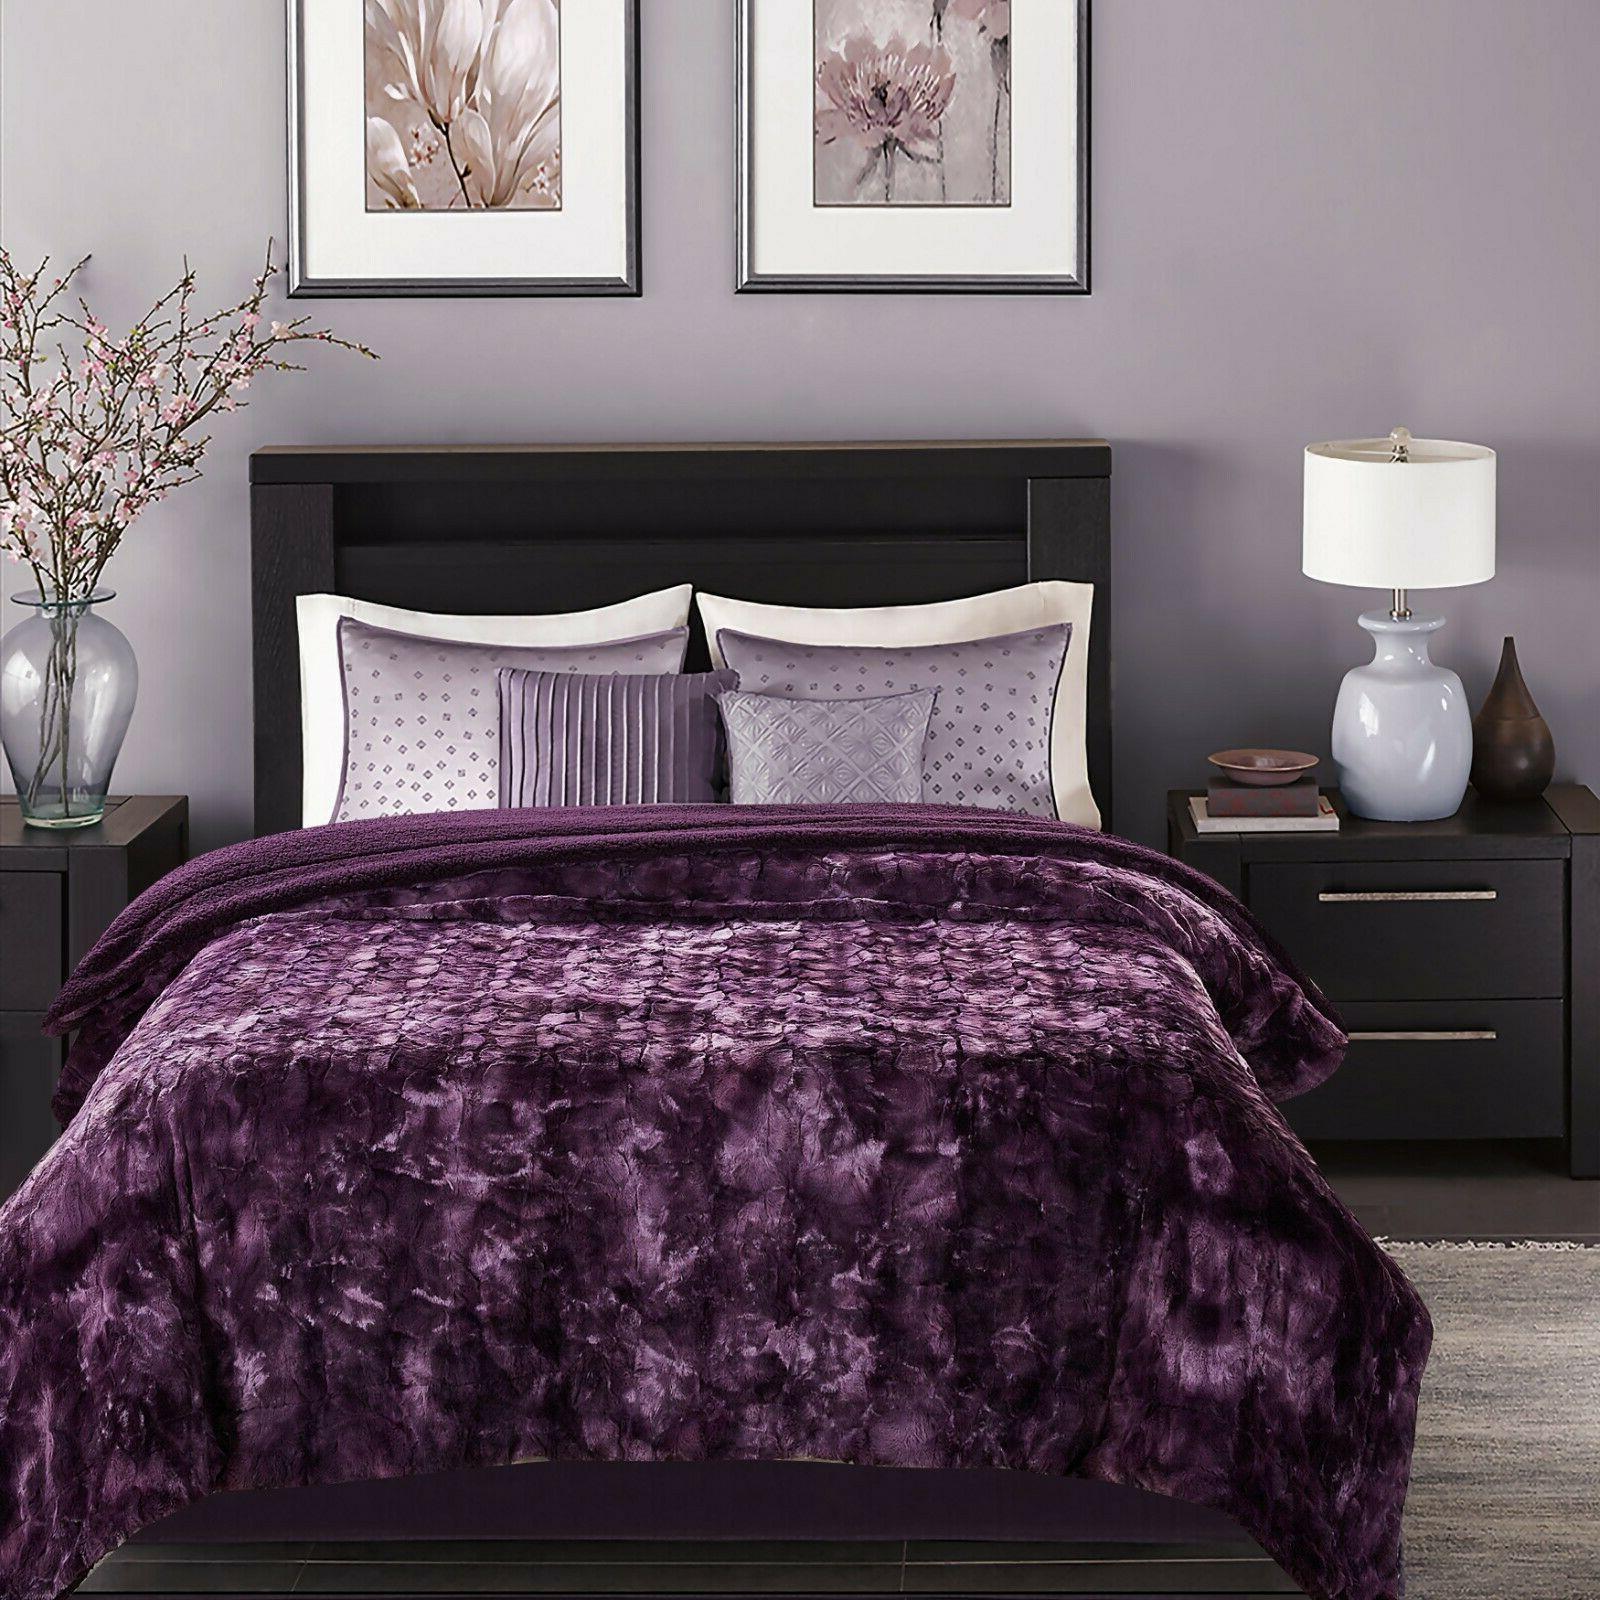 Chanasya Faux Fur Throw Blanket Fluffy Sherpa Bed Couch